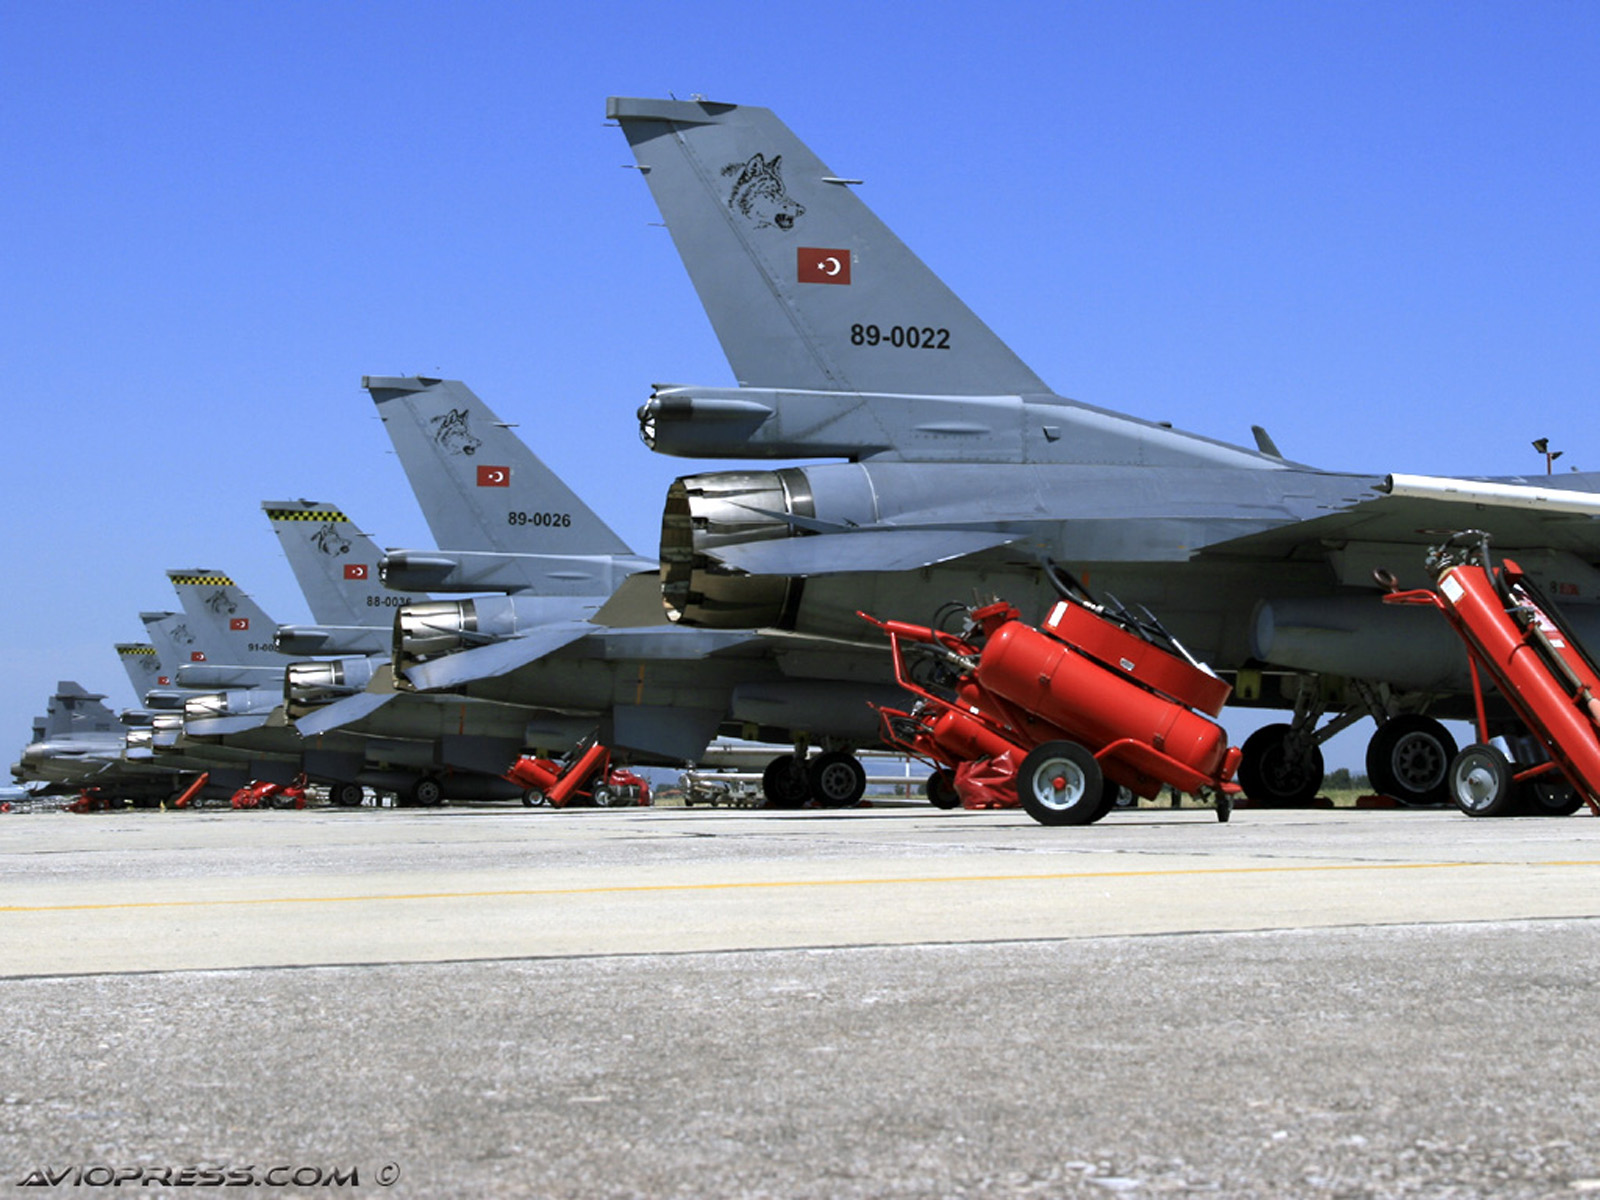 http://3.bp.blogspot.com/-VoY9H5EGkmQ/TiYGzjXJJHI/AAAAAAAAAig/RwYqnbFraiw/s1600/f-16-turkish.jpg